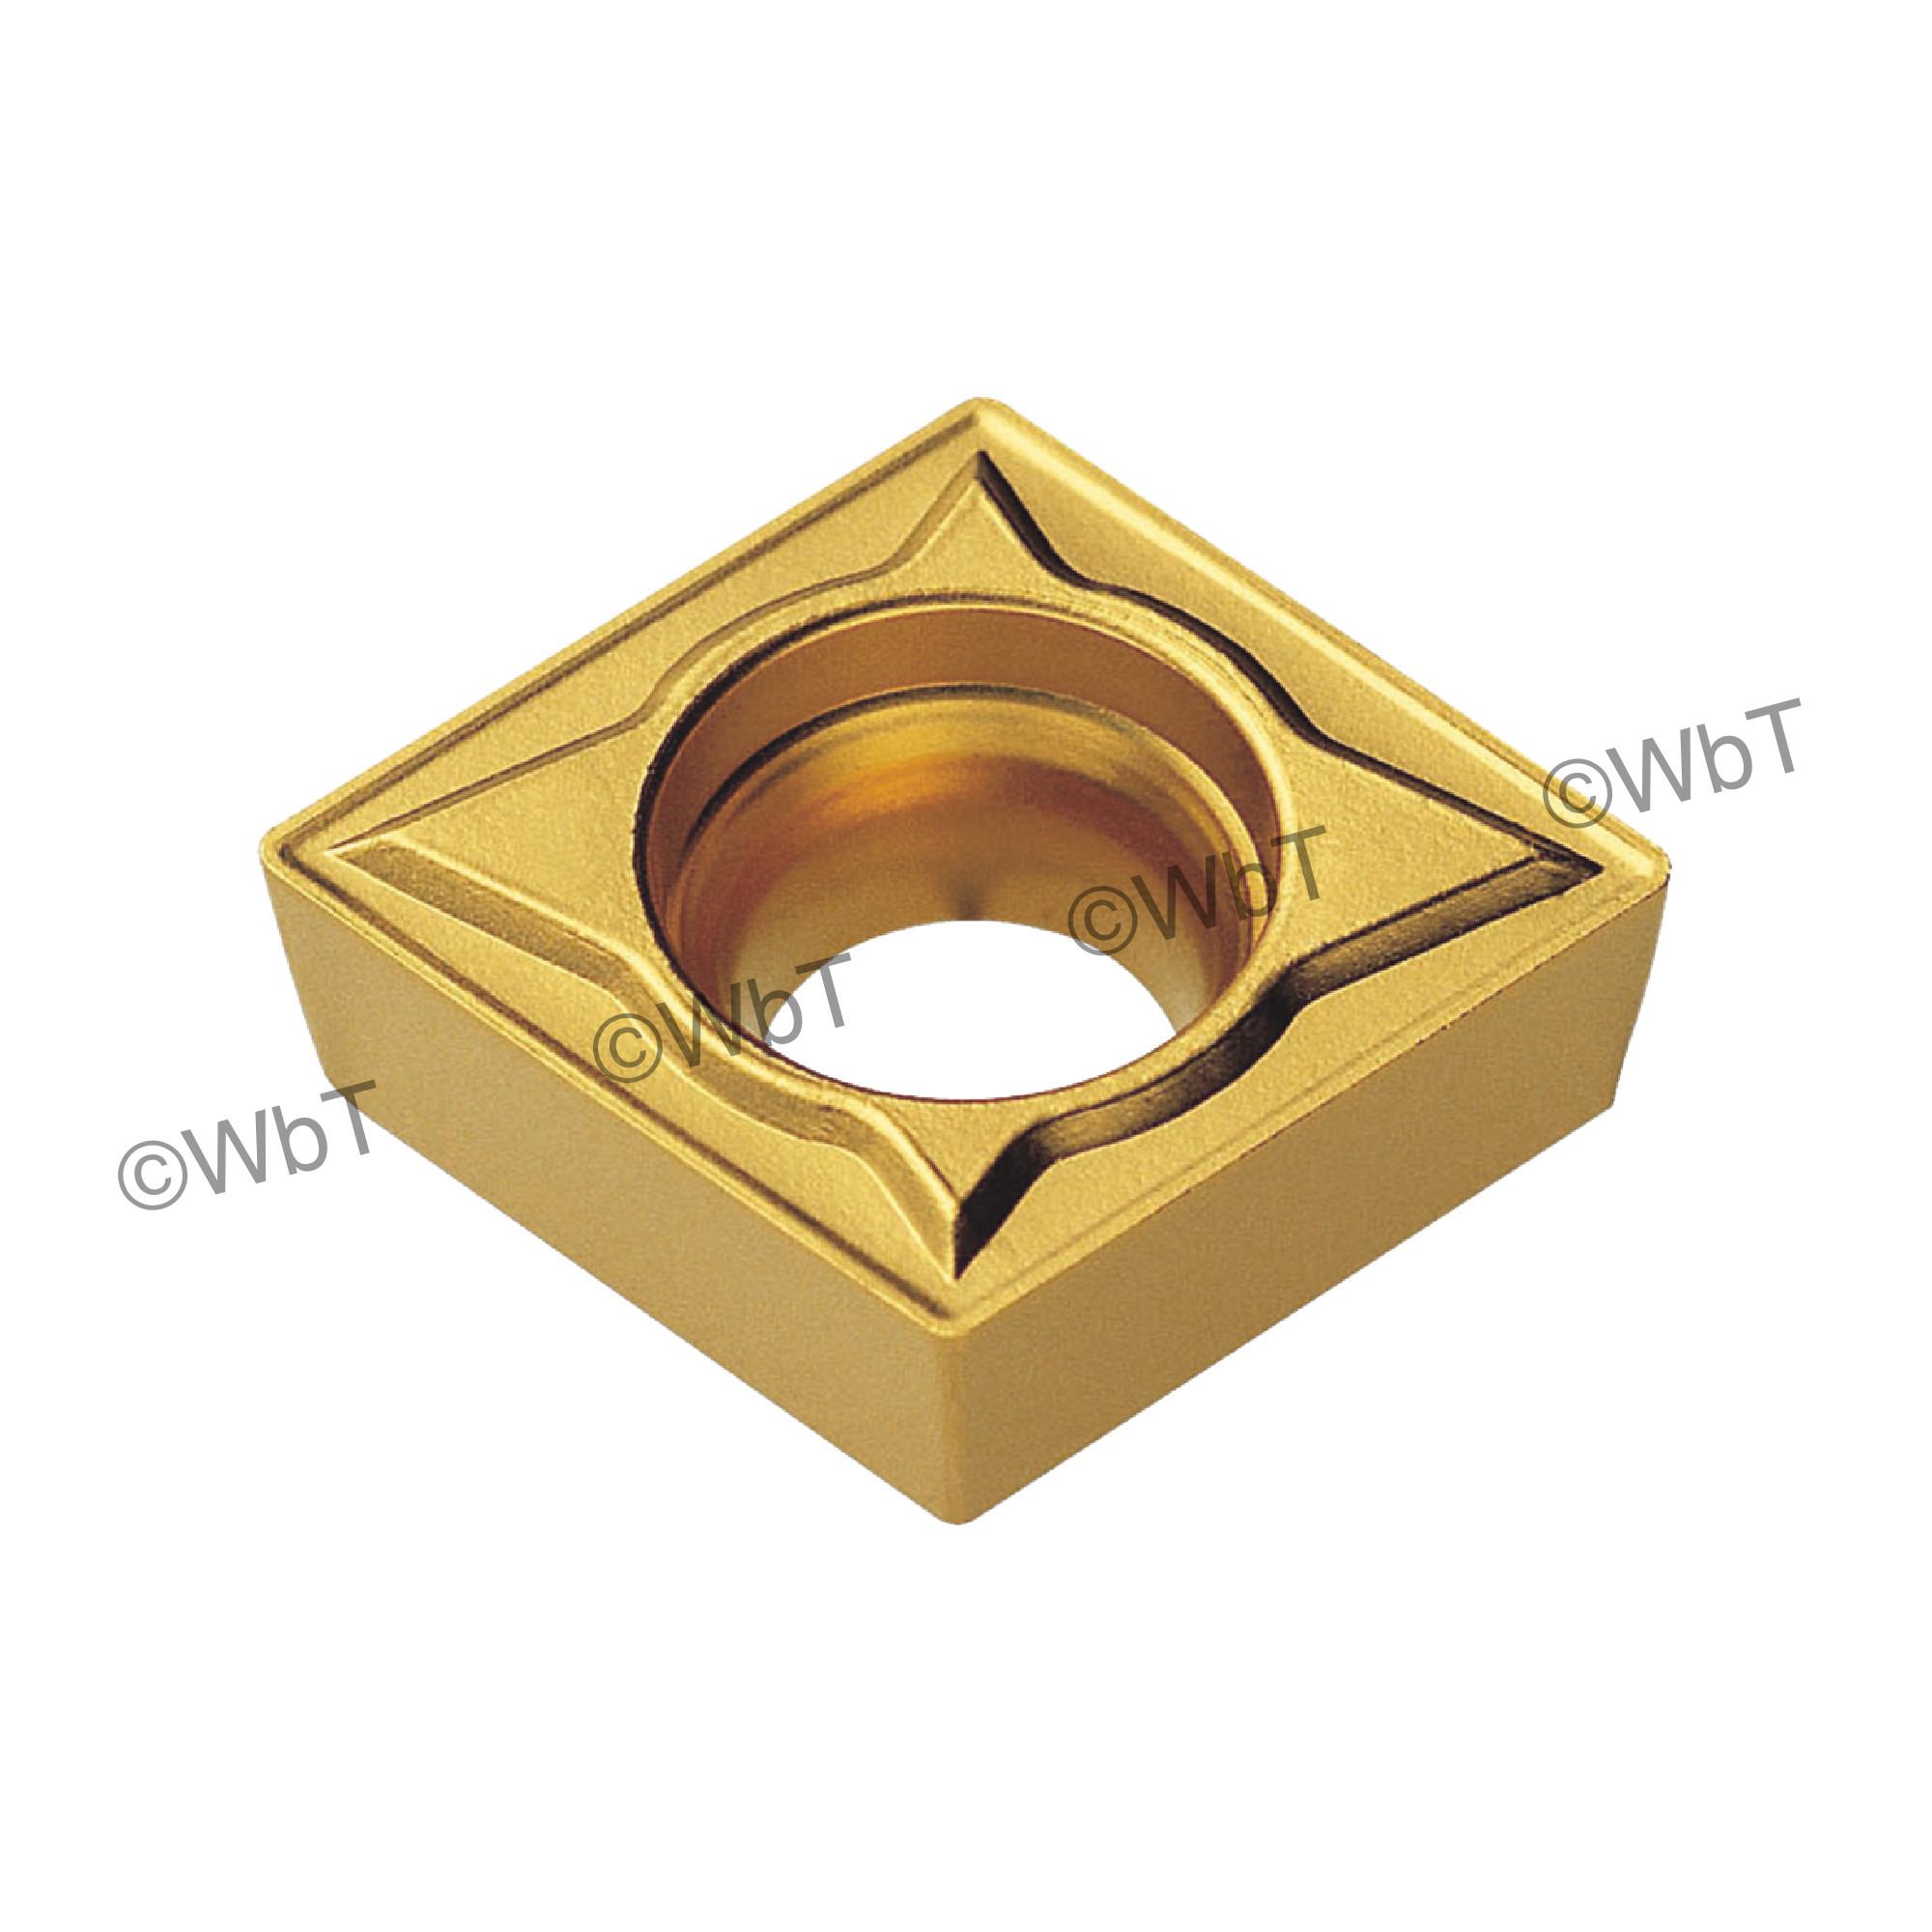 AKUMA - CCMT432-MP1 CT25M - 80° Diamond / Indexable Carbide Turning Insert